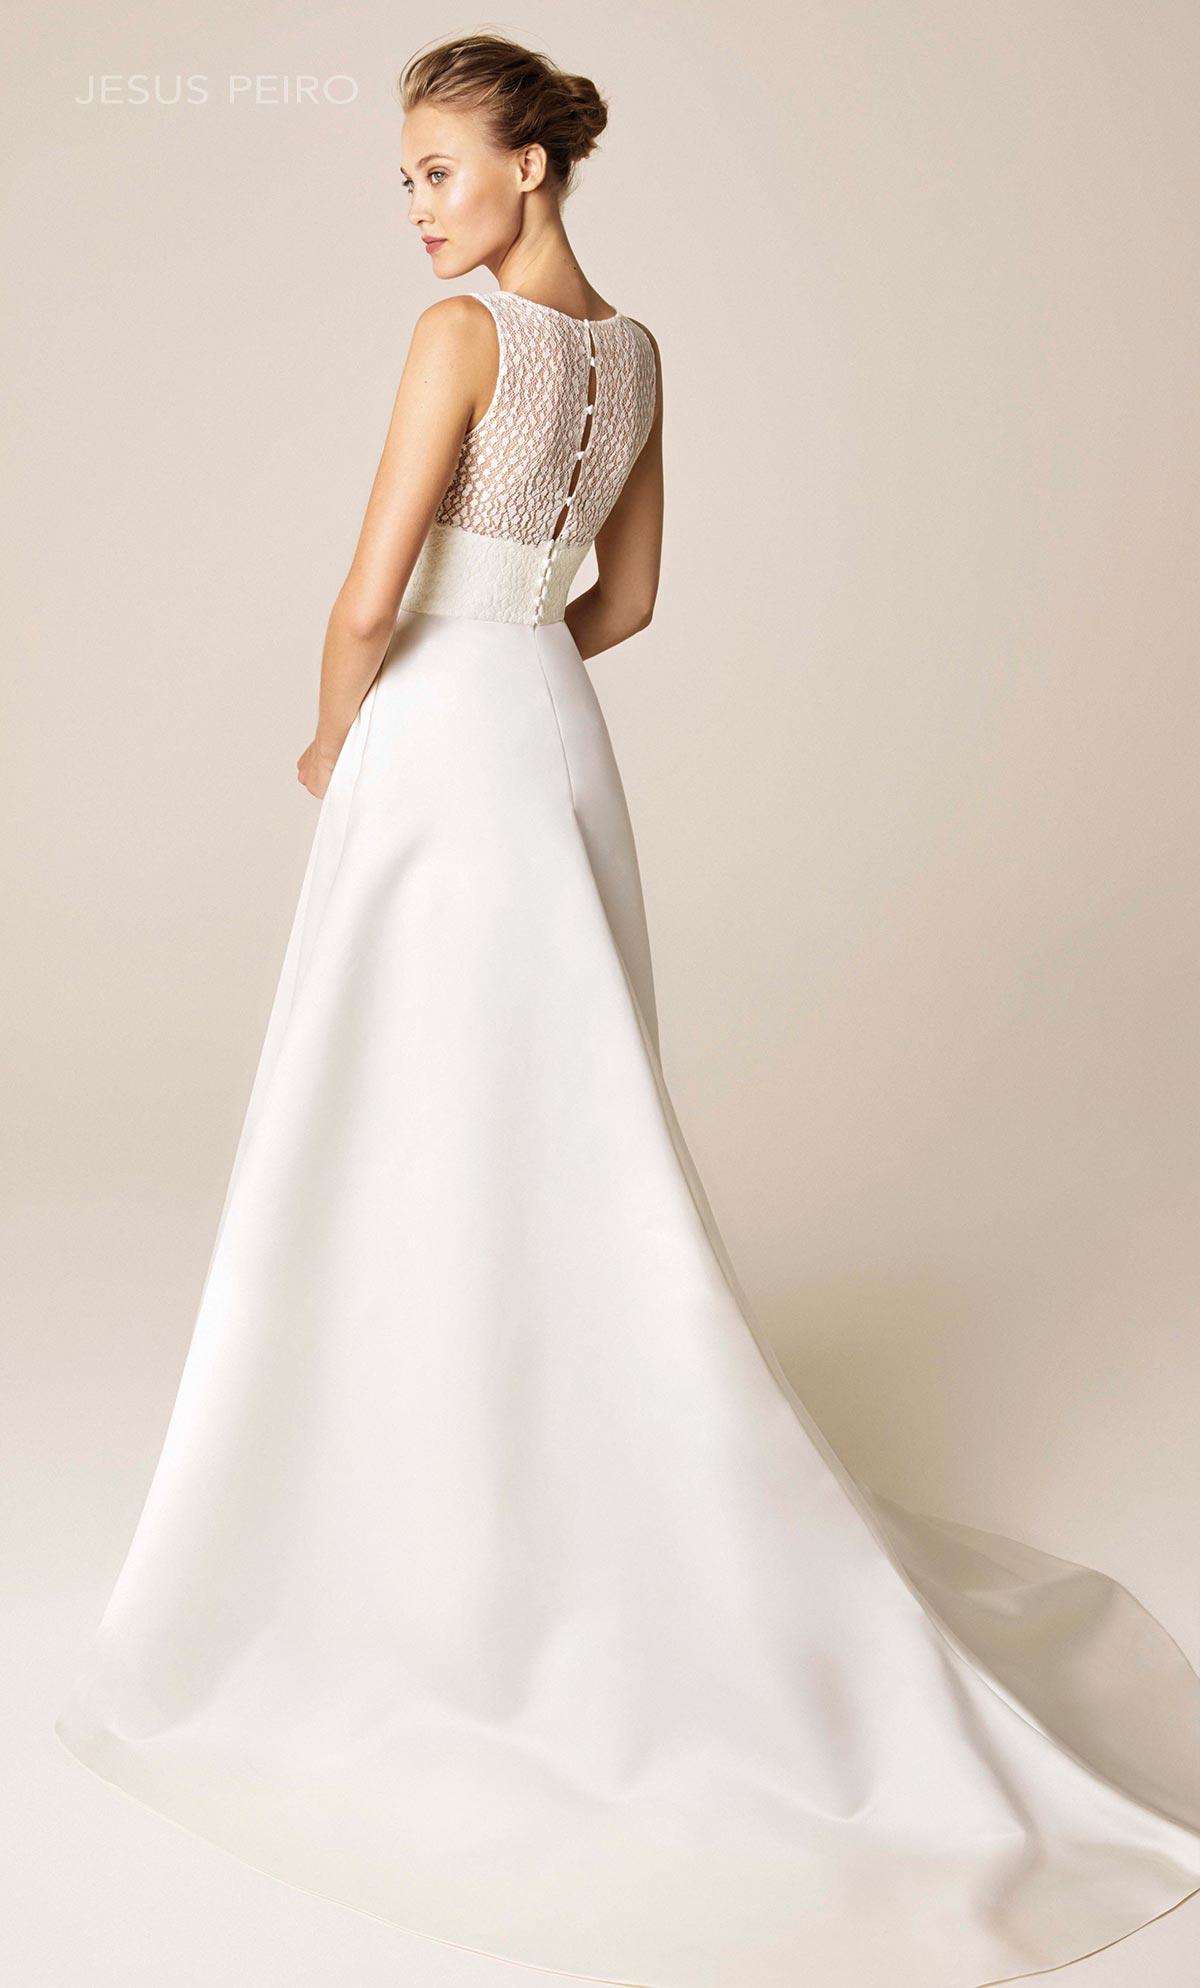 Vestido novia Jesús Peiró Ref.965